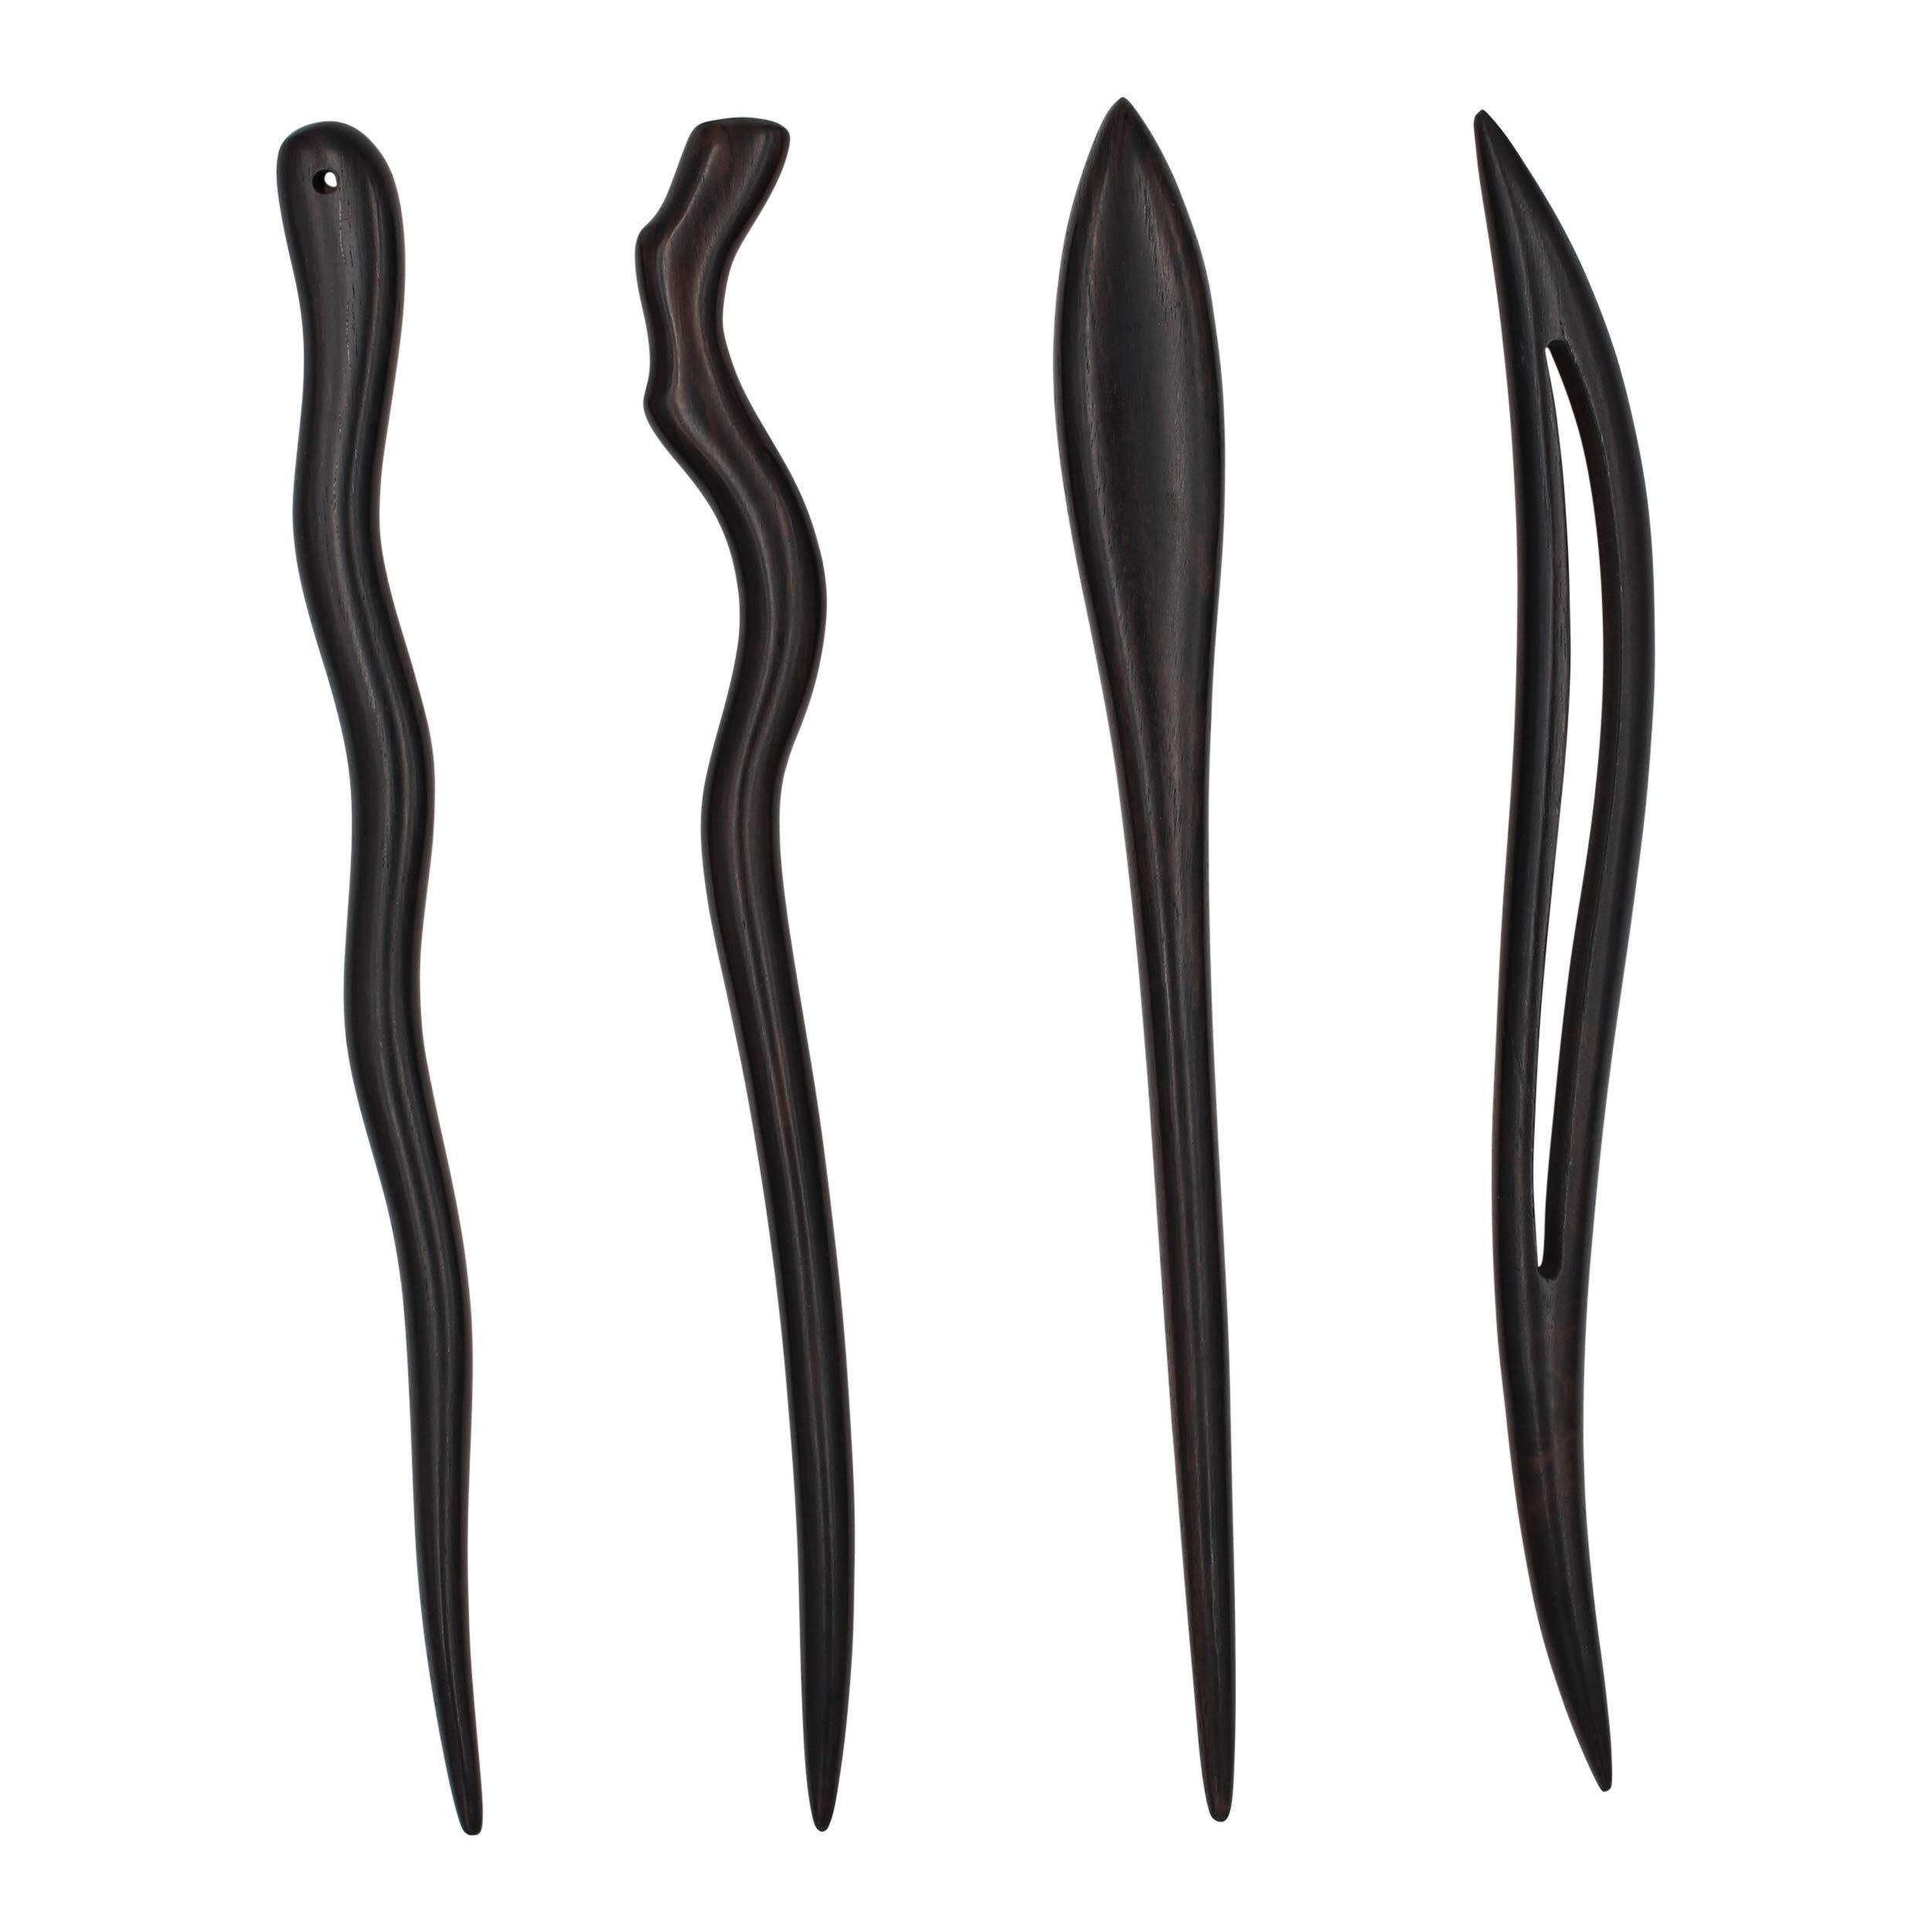 REAL SIC - Natural Sandalwood Hair Sticks for Women - Set of 4 - Sustainable Retro Boho Fashion Chopsticks/Wood Hair Pins for Long Hair (Outdoor Fun Set)